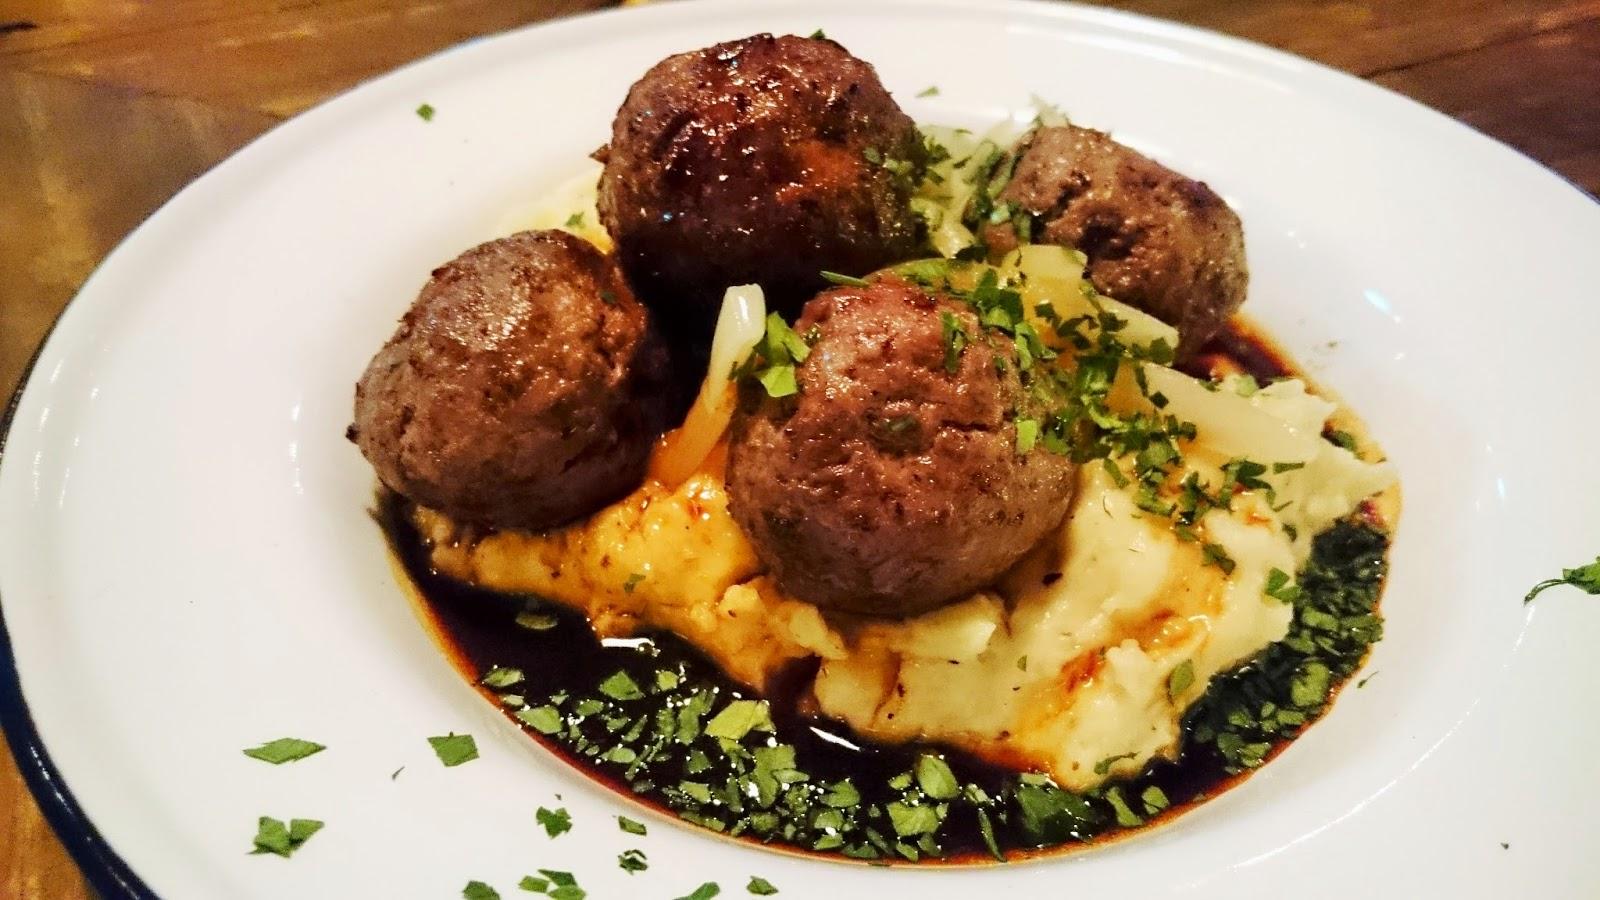 wagyu meatballs with mashed potato